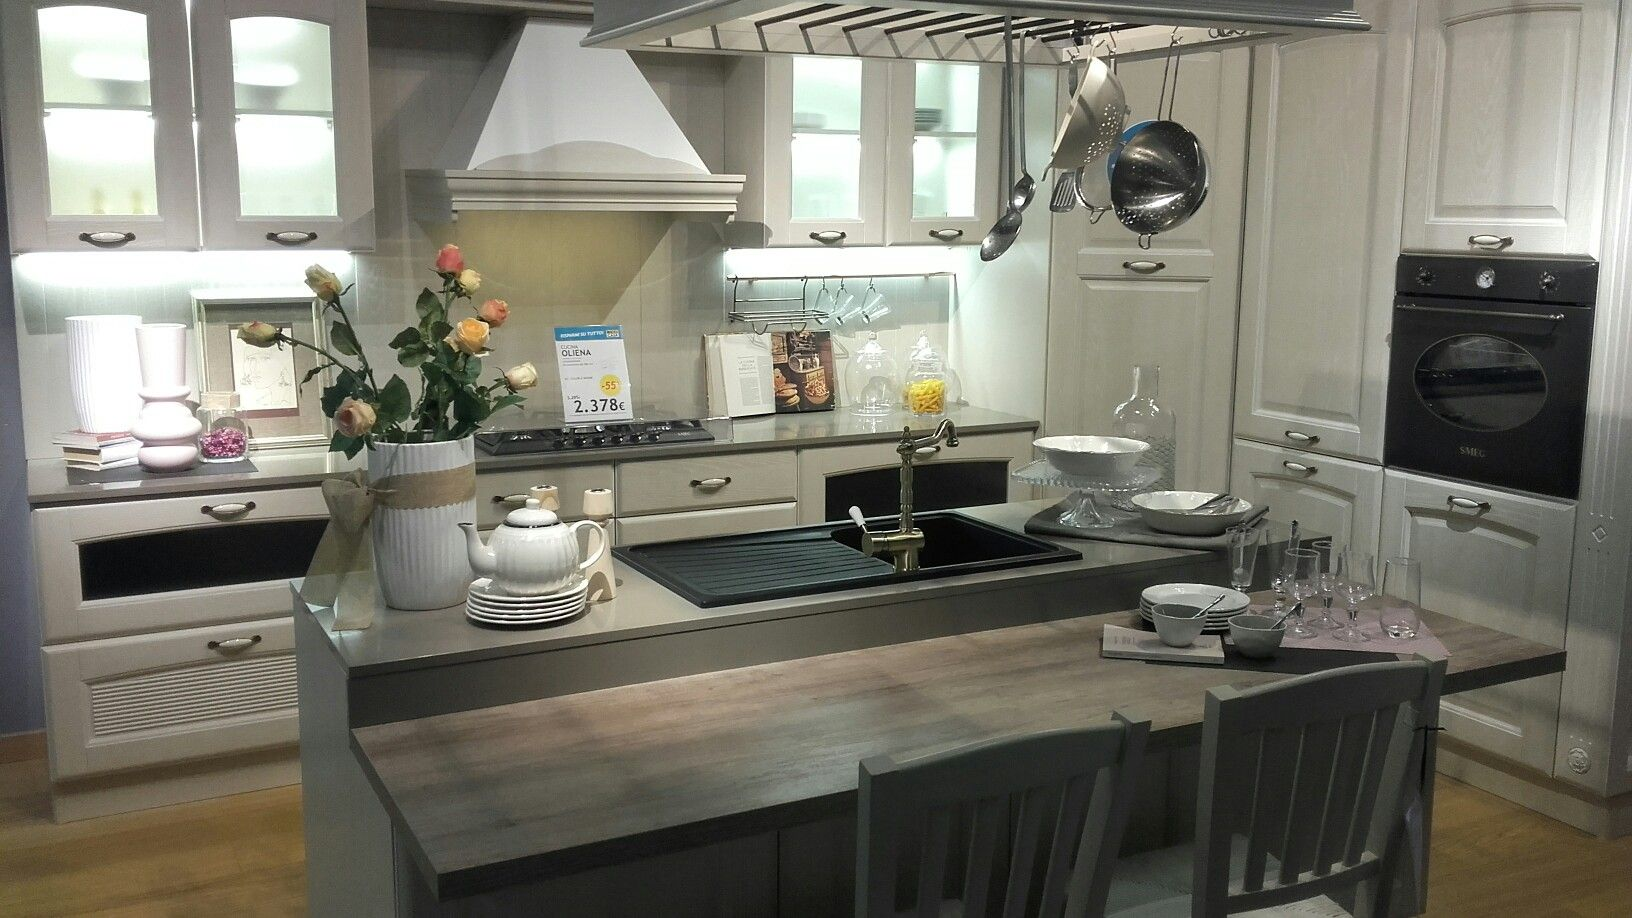 Cucina Ricci casa | Kitchens | Pinterest | Ricci e Cucina